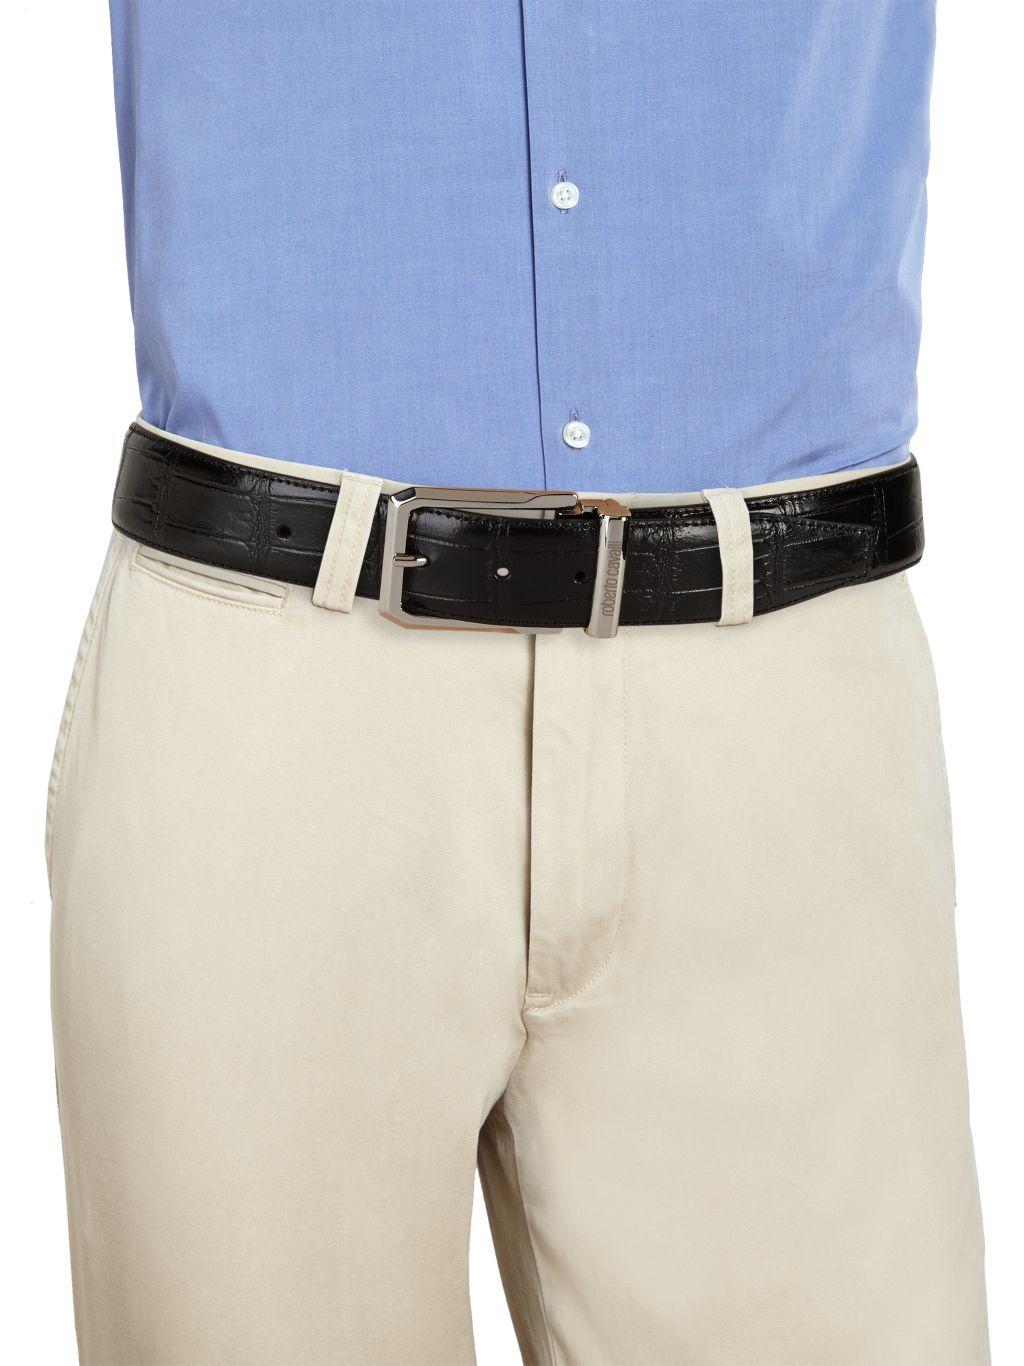 Roberto Cavalli Croc-Embossed Leather Belt